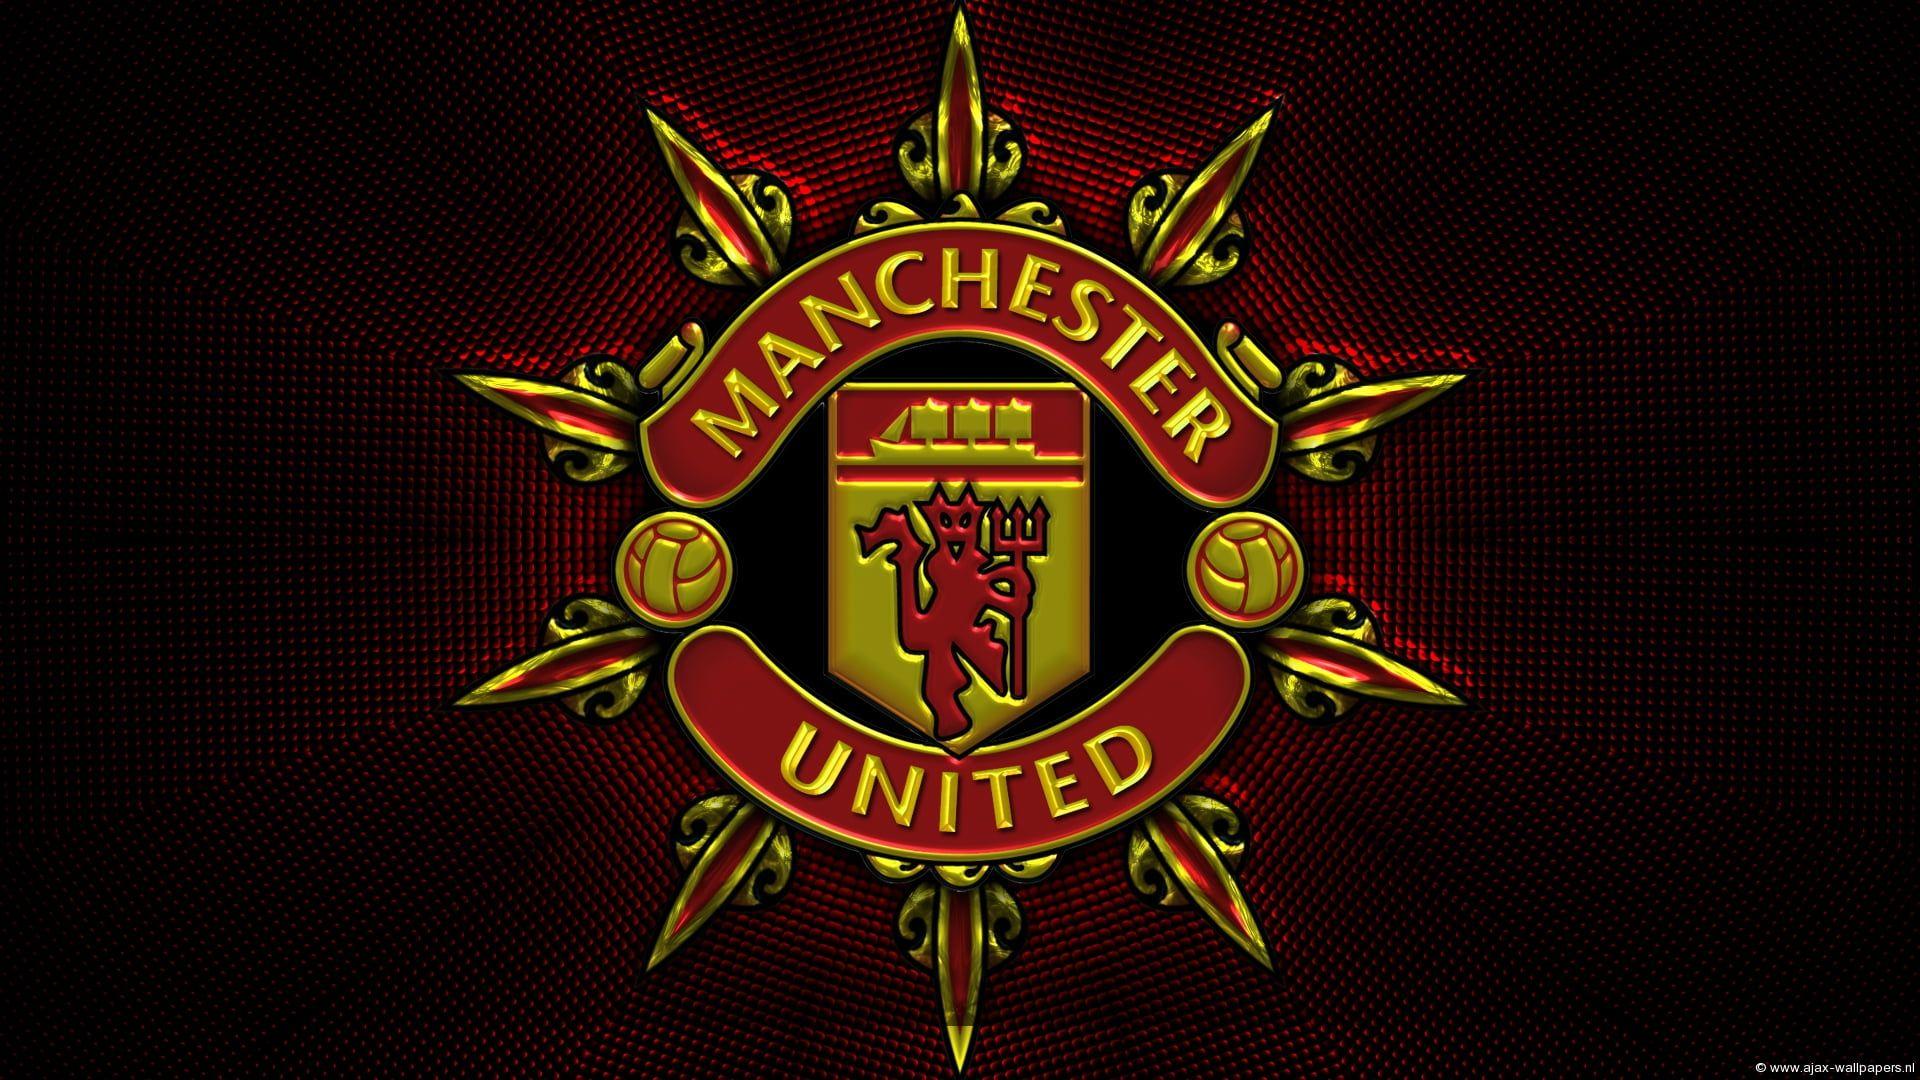 Soccer Manchester United F C Emblem Logo 1080p Wallpaper Hdwallpaper Desktop Manchester United Ryan Giggs Sepak Bola